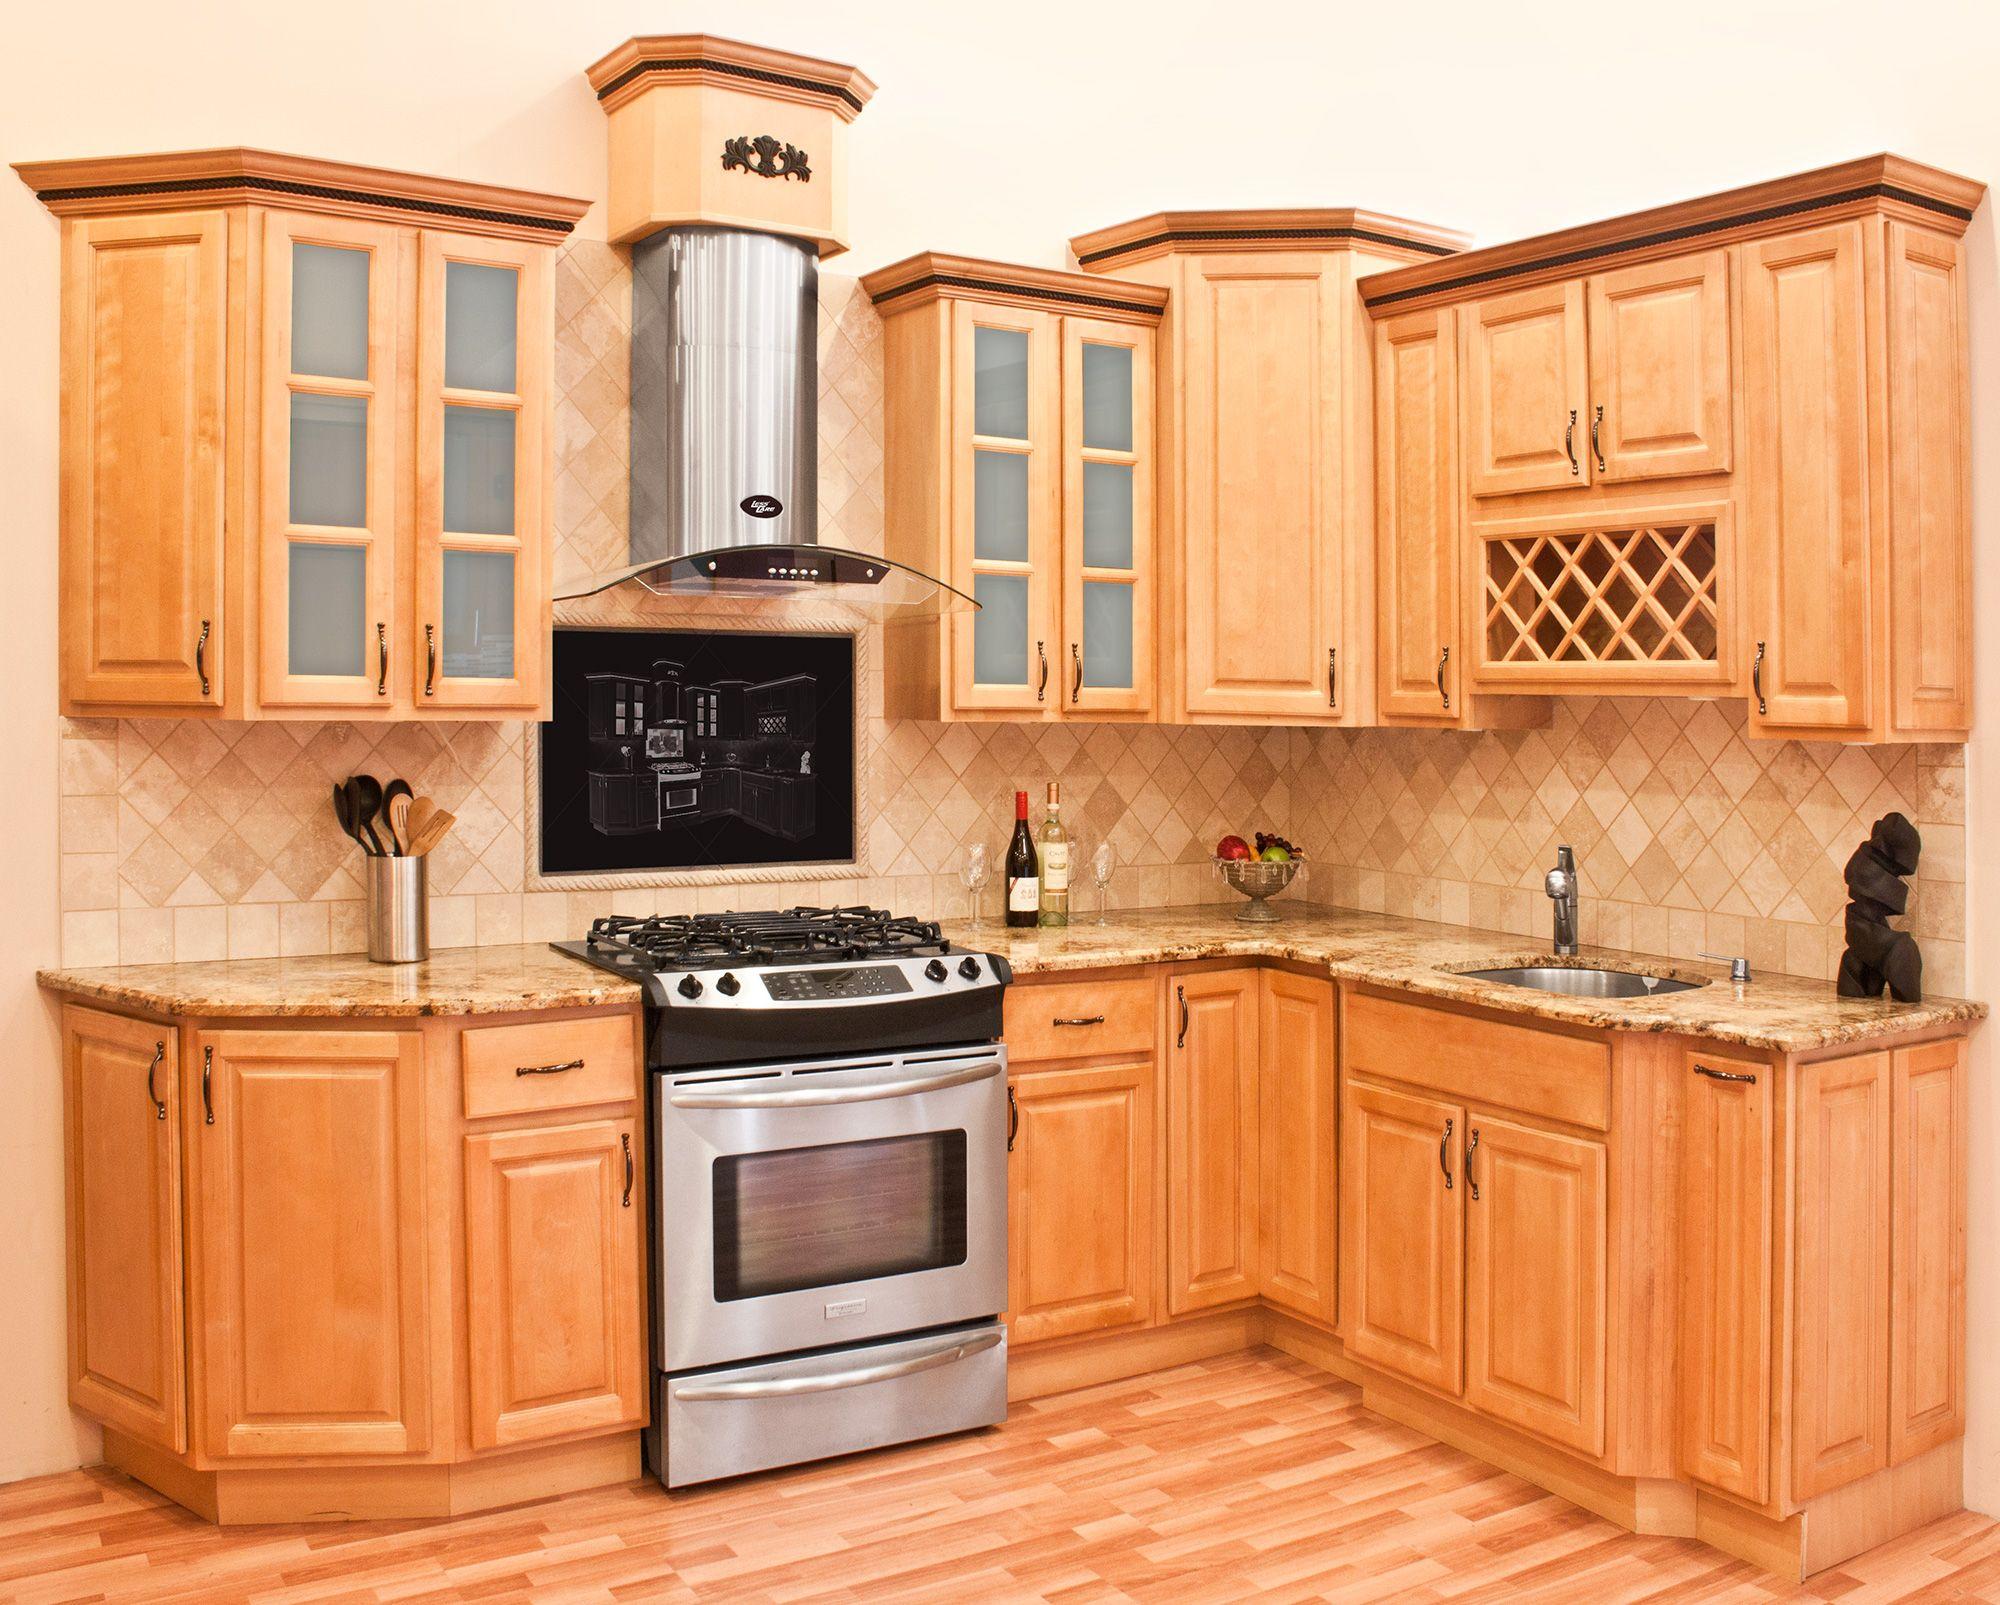 backsplash for kitchen with honey oak Google